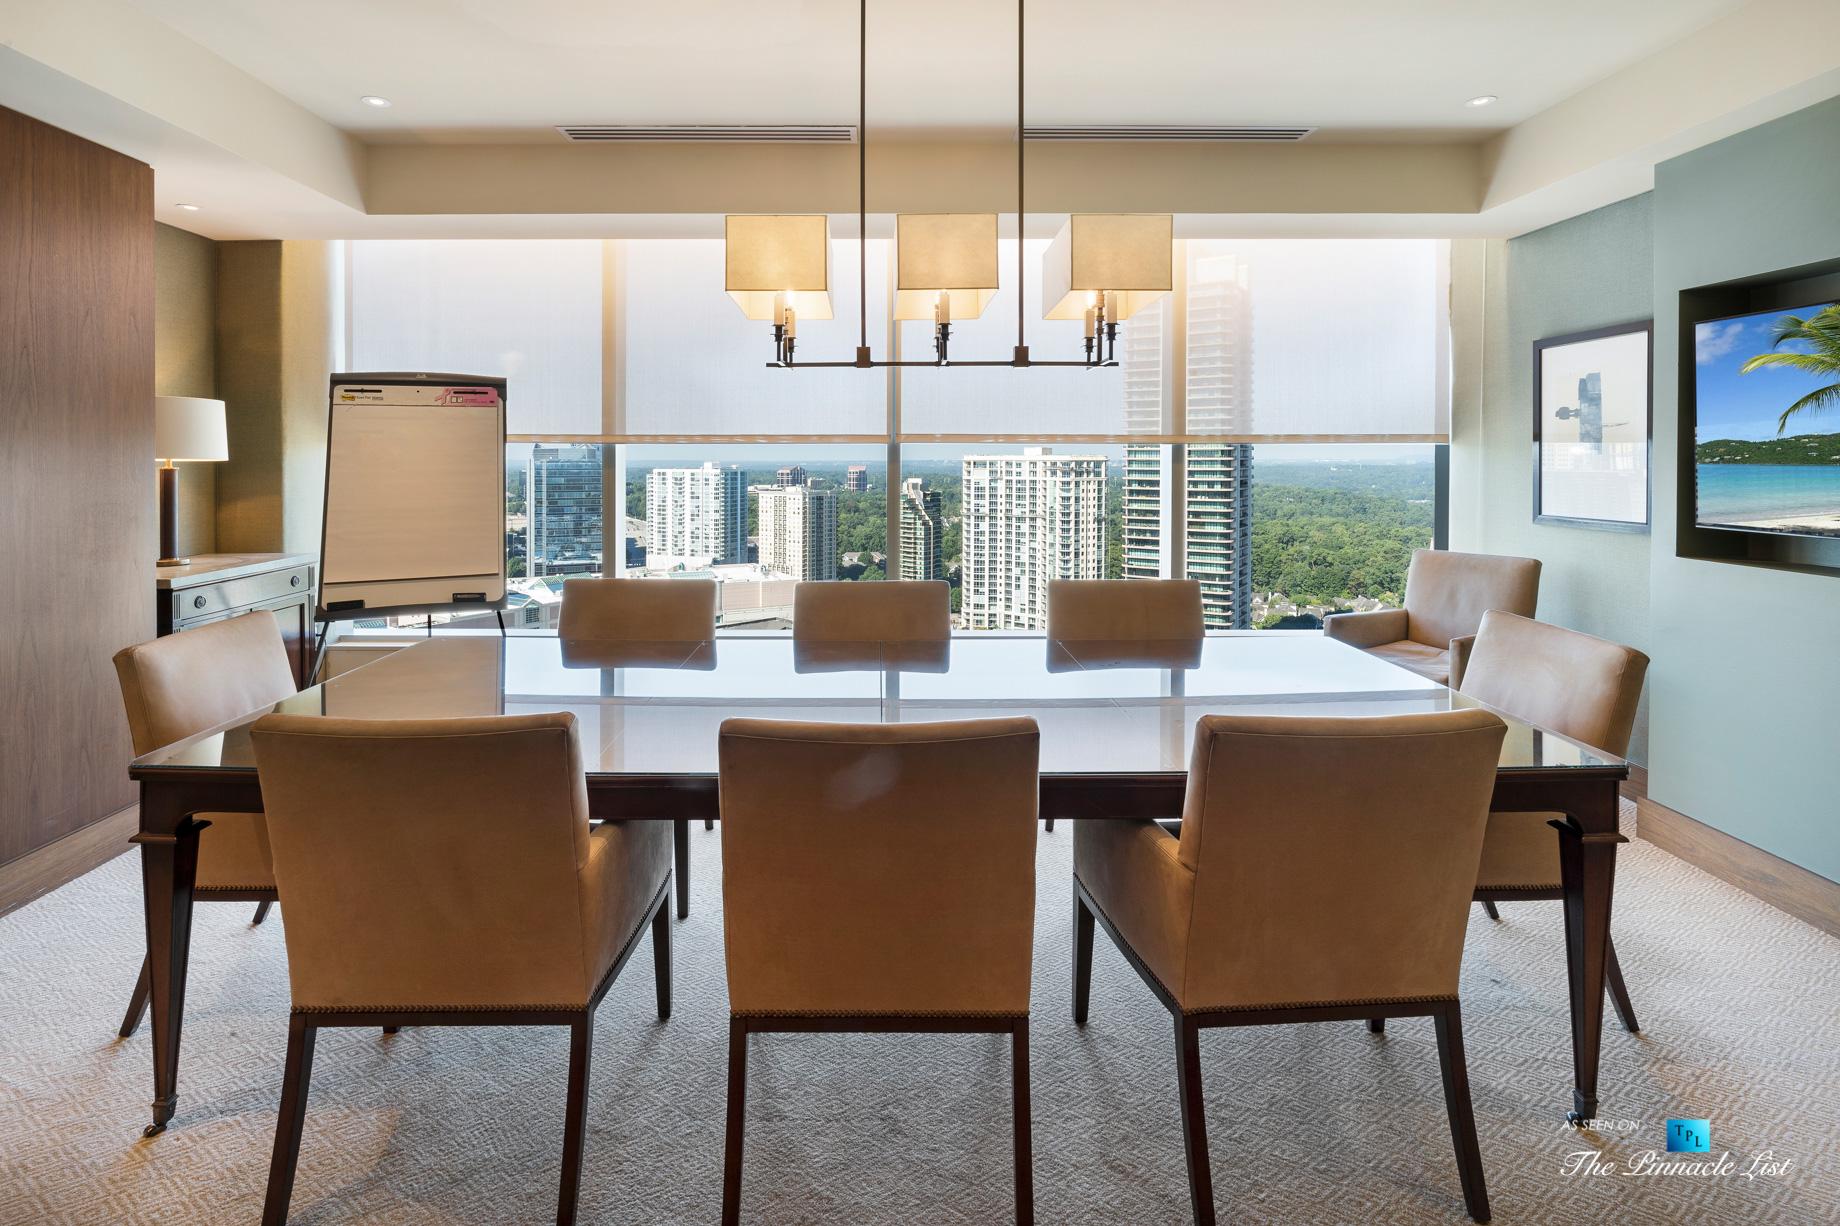 3630 Peachtree Rd NE, Unit 2307, Atlanta, GA, USA - Apartment Amenities Room - Luxury Real Estate - Ritz-Carlton Residences Buckhead